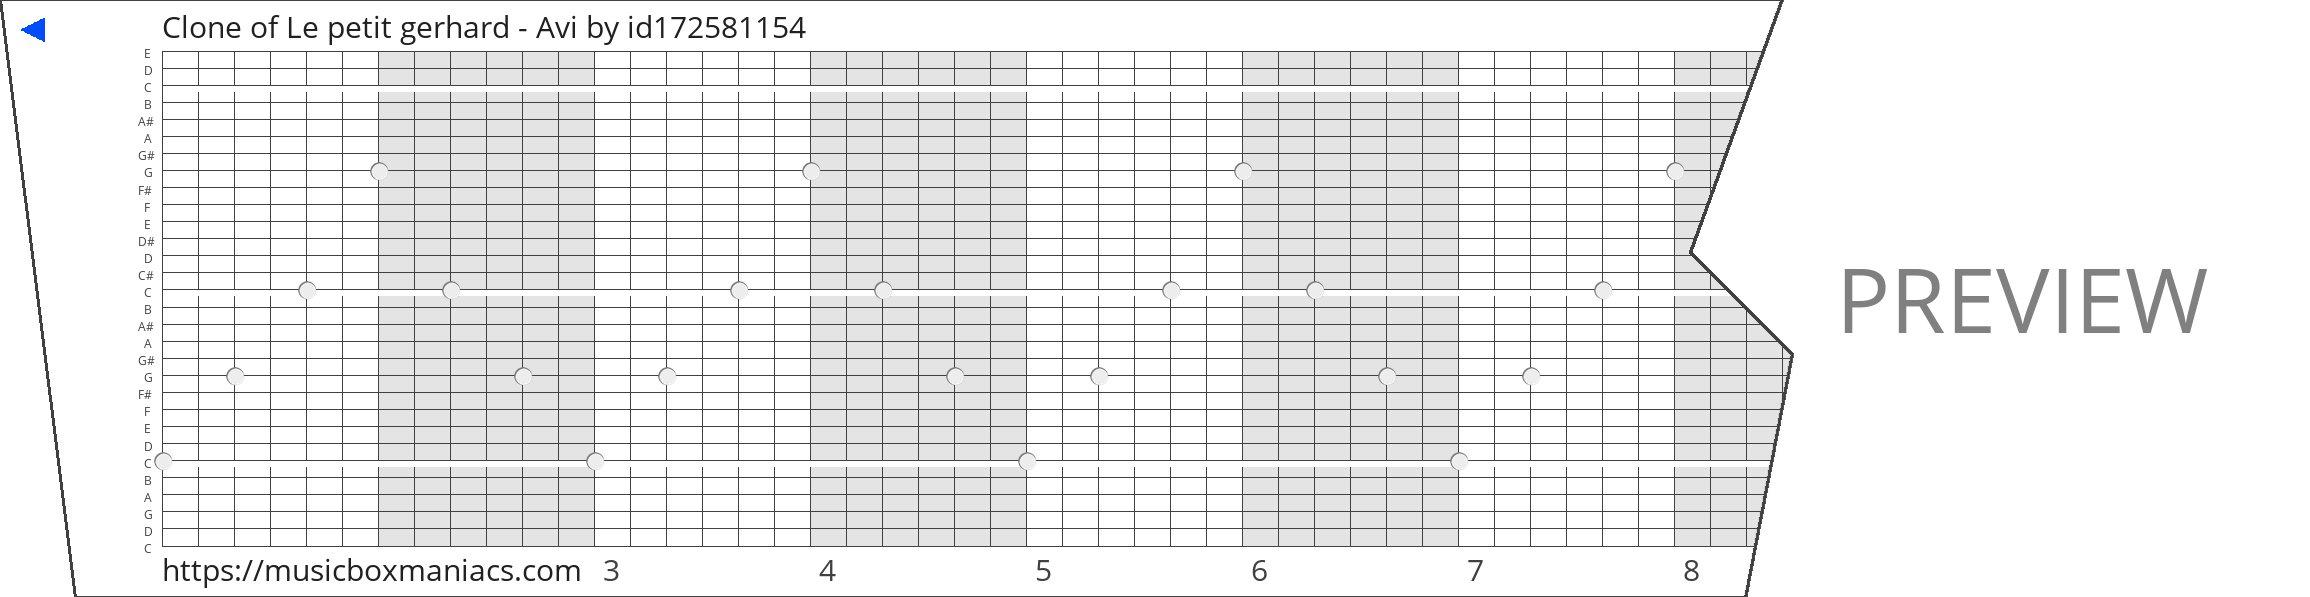 Clone of Le petit gerhard - Avi 30 note music box paper strip